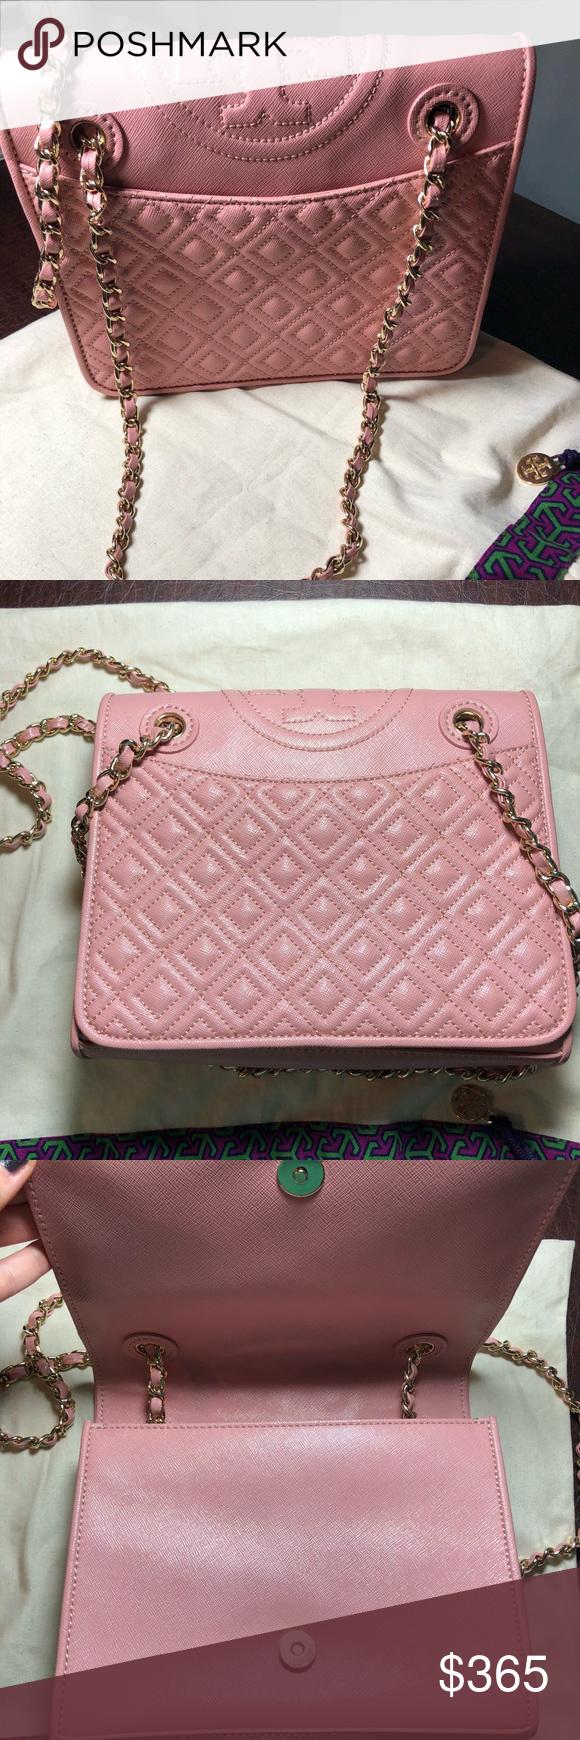 4156e096c80 Tory Burch Fleming Medium Bag Rose Sachet BRAND NEW!!! Tory Burch Fleming  Medium